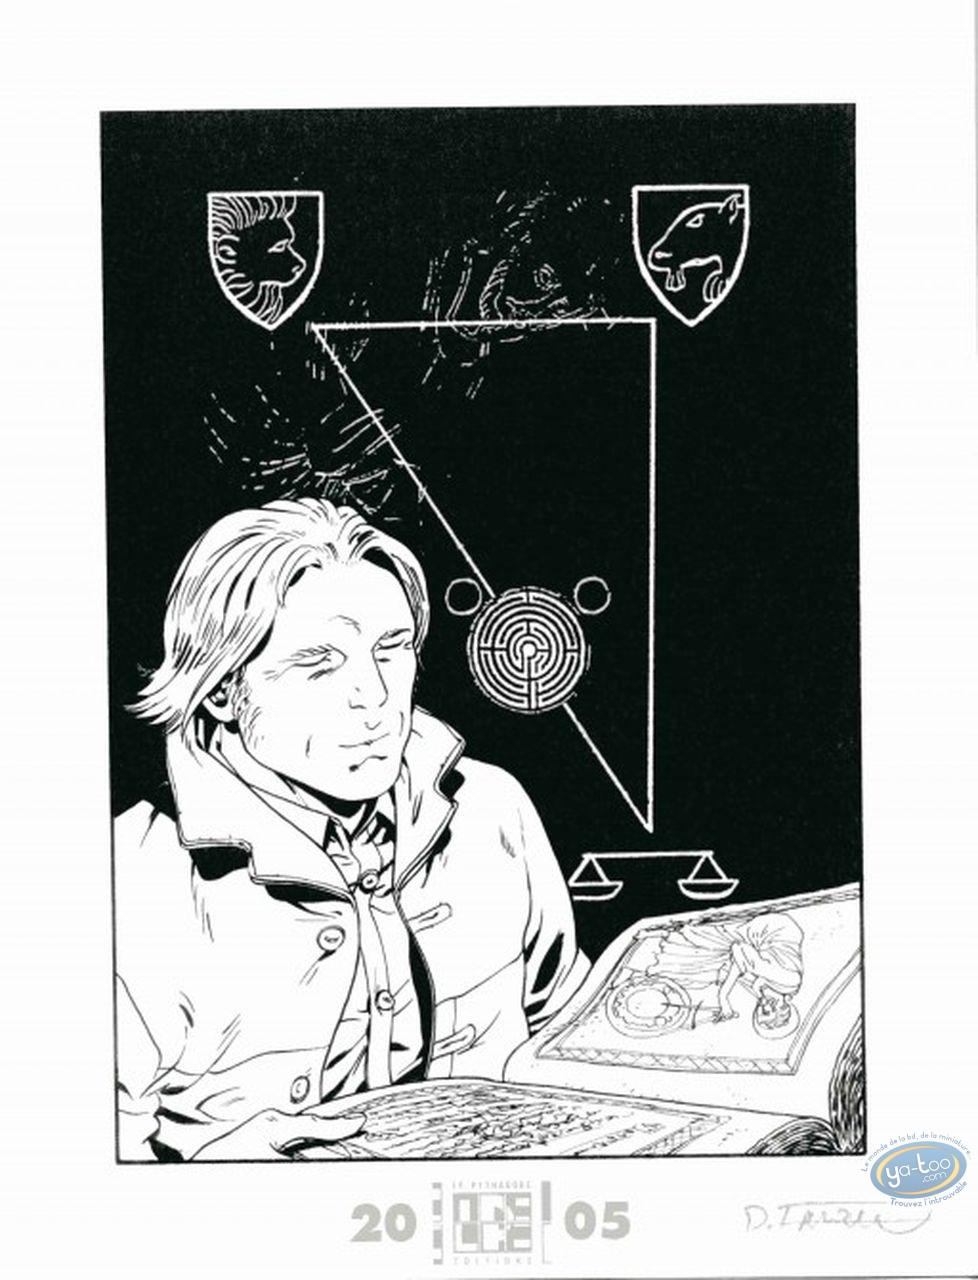 Bookplate Offset, Triangle Secret (Le) : The Book